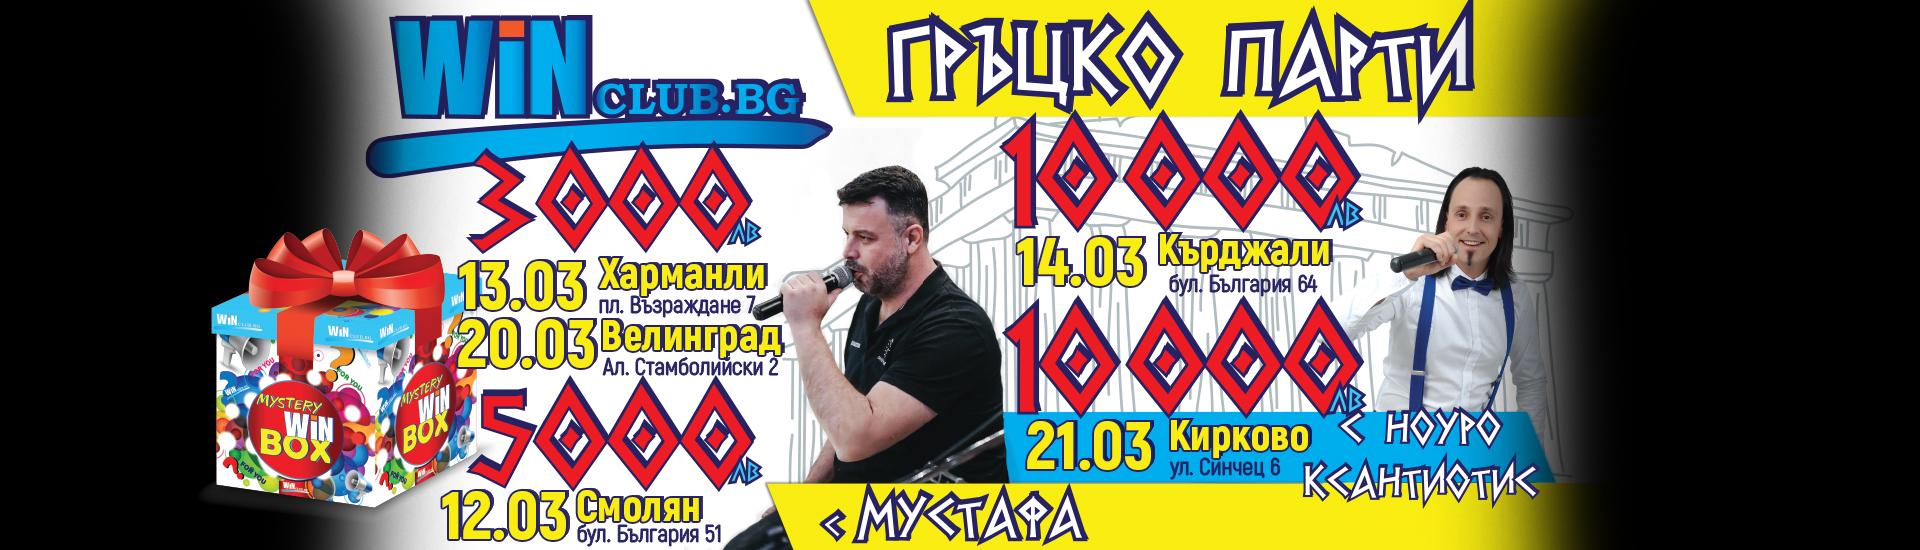 site_grycko-party